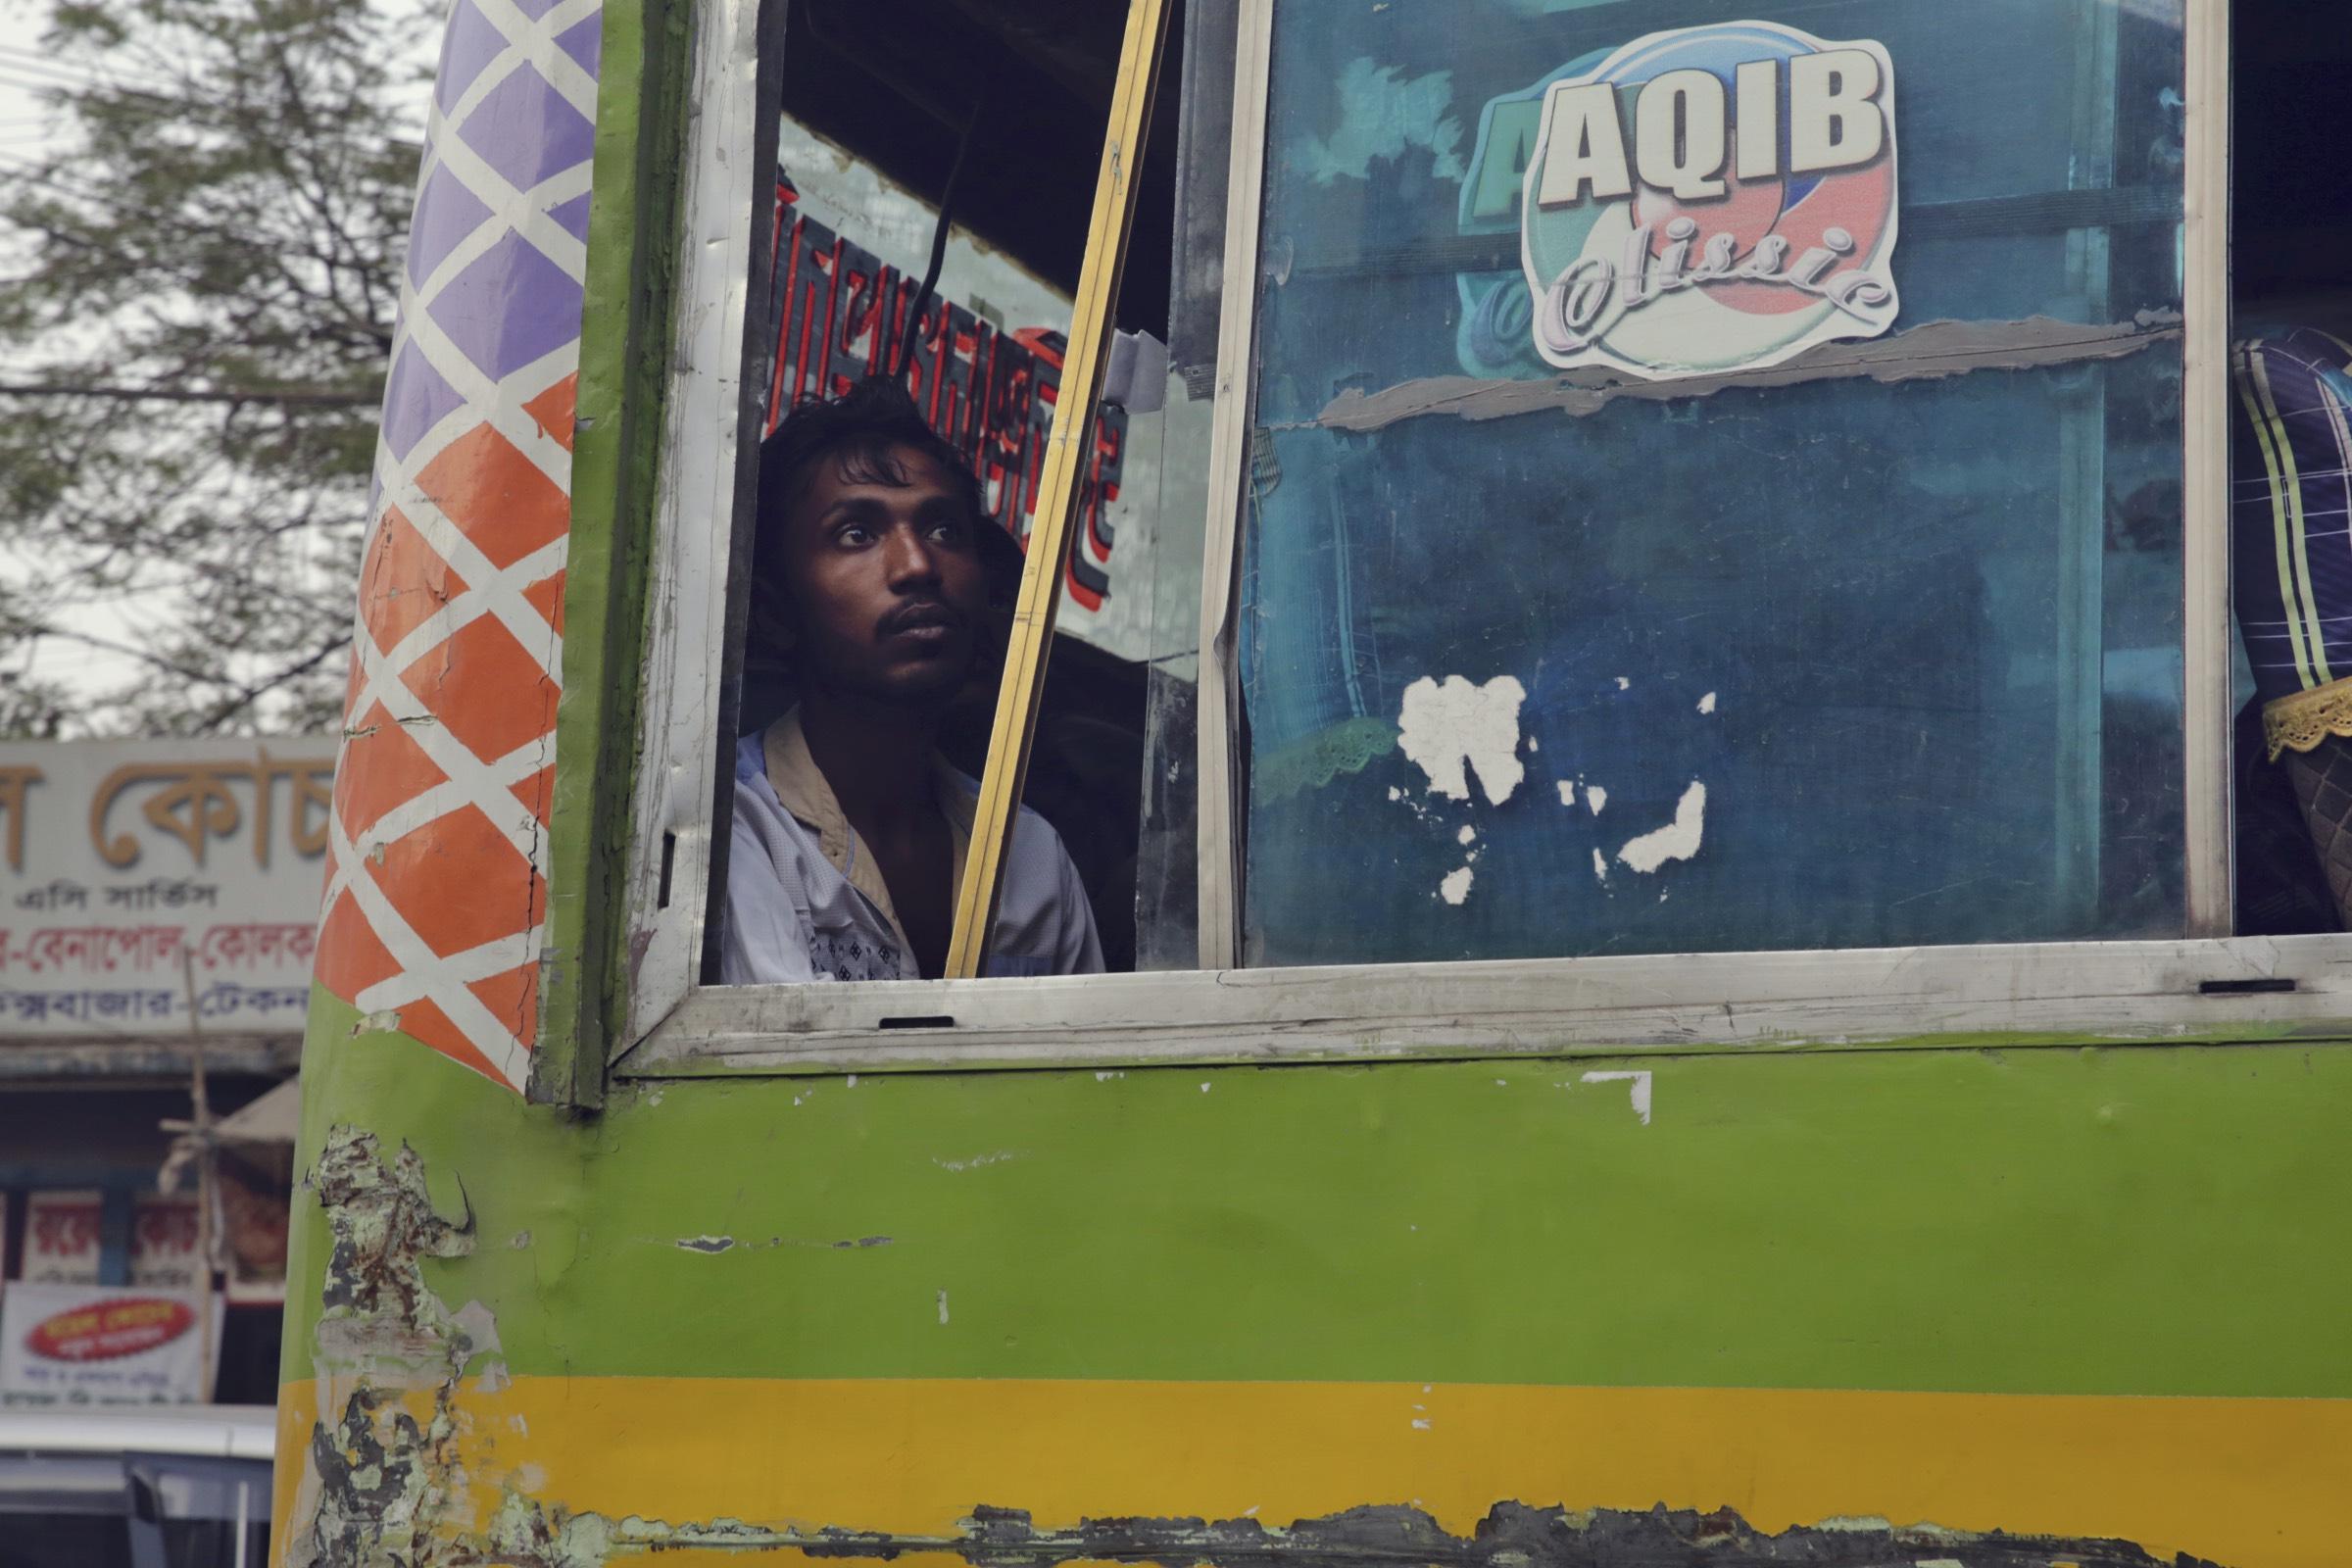 _P8B1712_Bangladesh_Man_in_Bus_foto_by_Jarek_Raczek_WEB_final